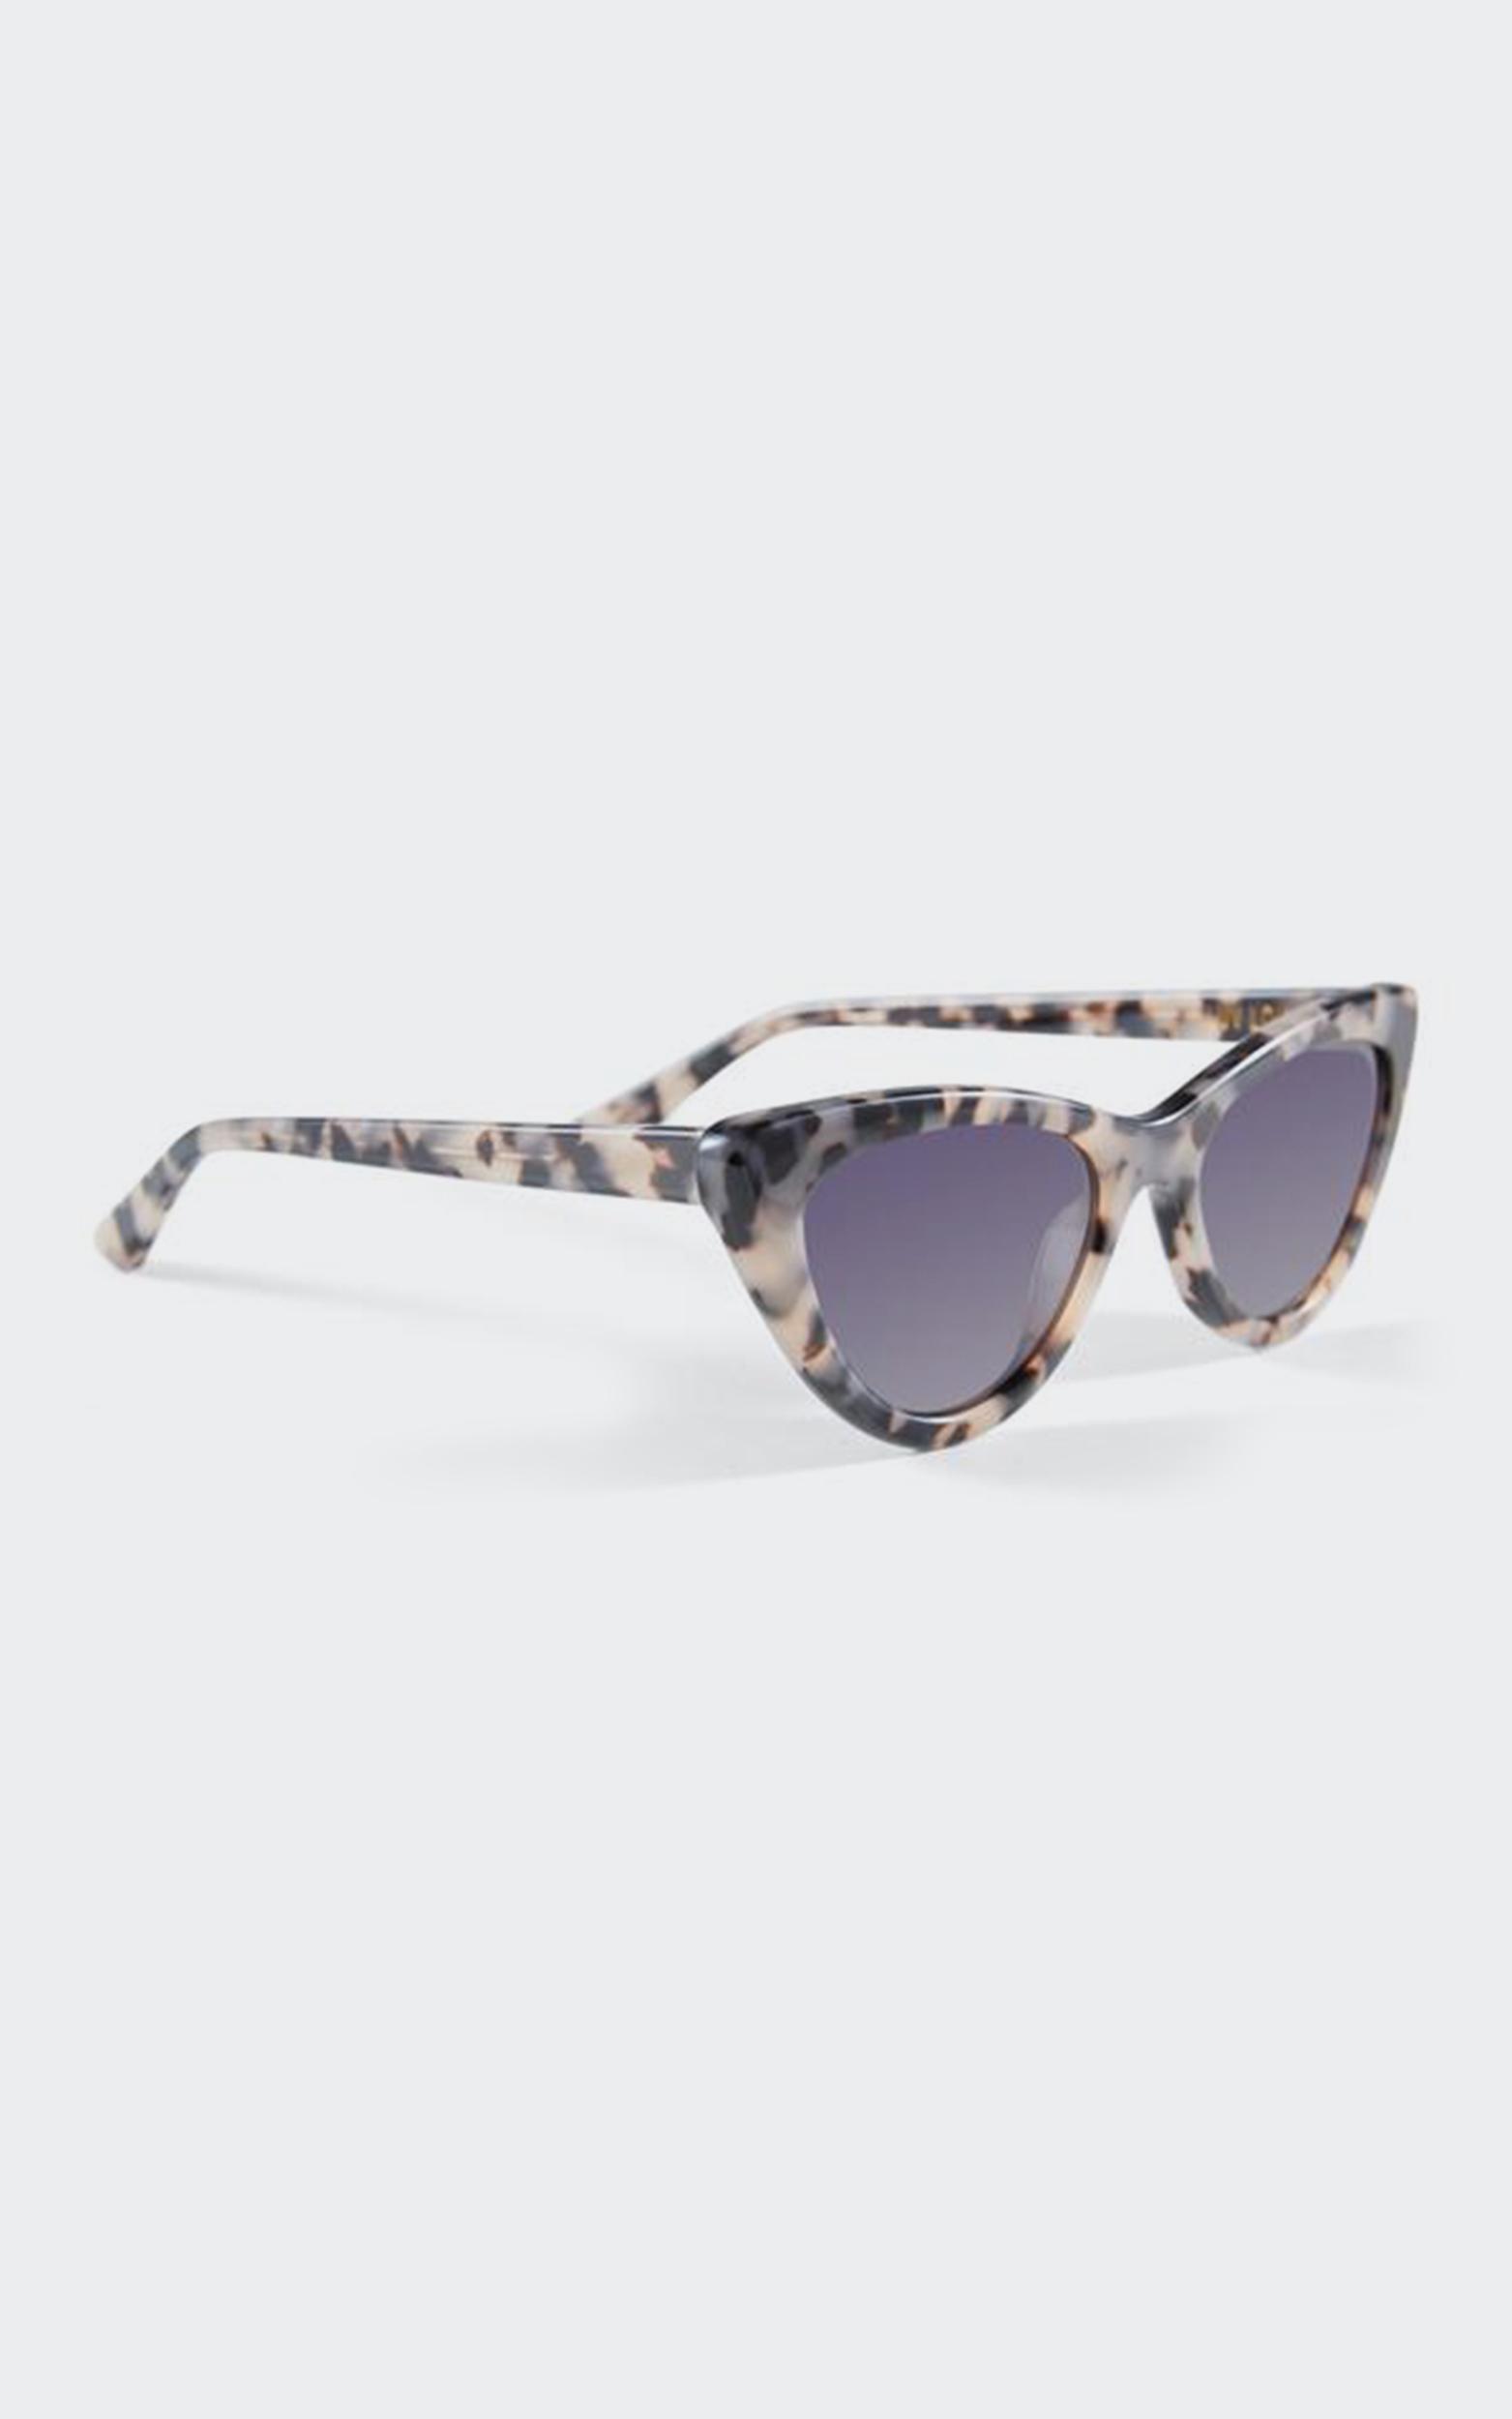 Luv Lou - The Leui Sunglasses in Tort, Brown, hi-res image number null